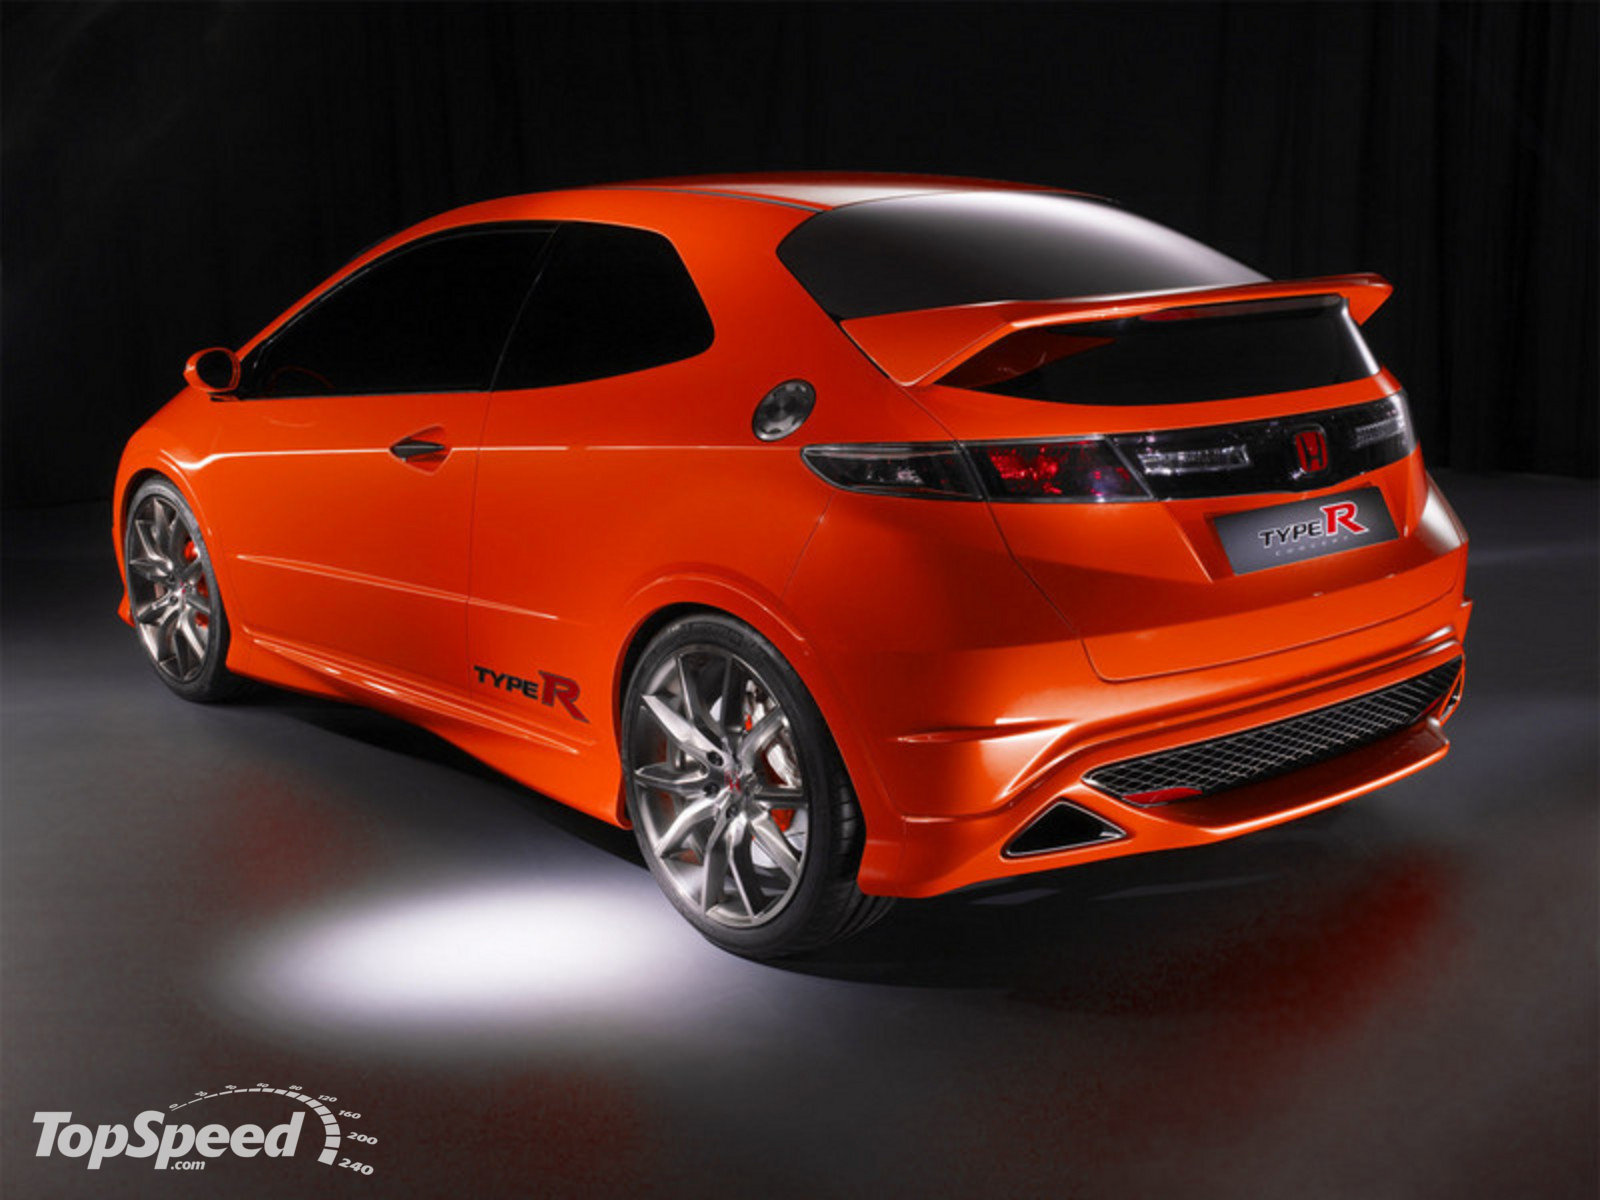 2007 Honda Civic For Sale >> The world sports cars: honda civic type r